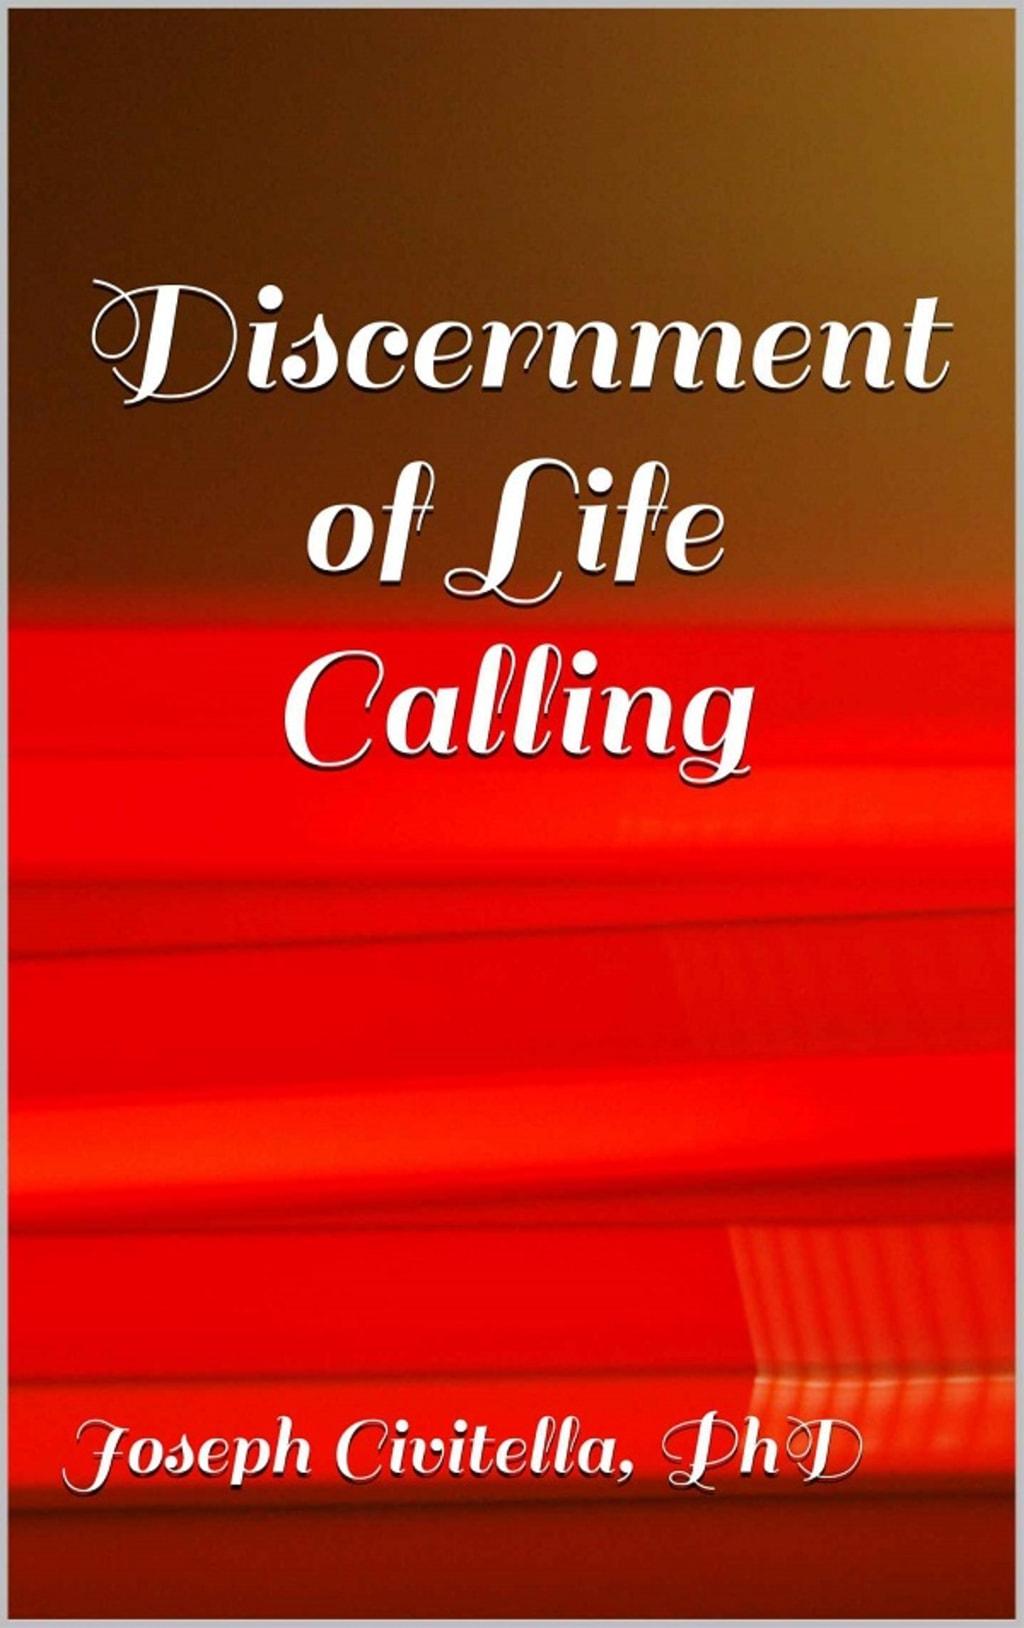 Discernment of Life Calling — Excerpt 9